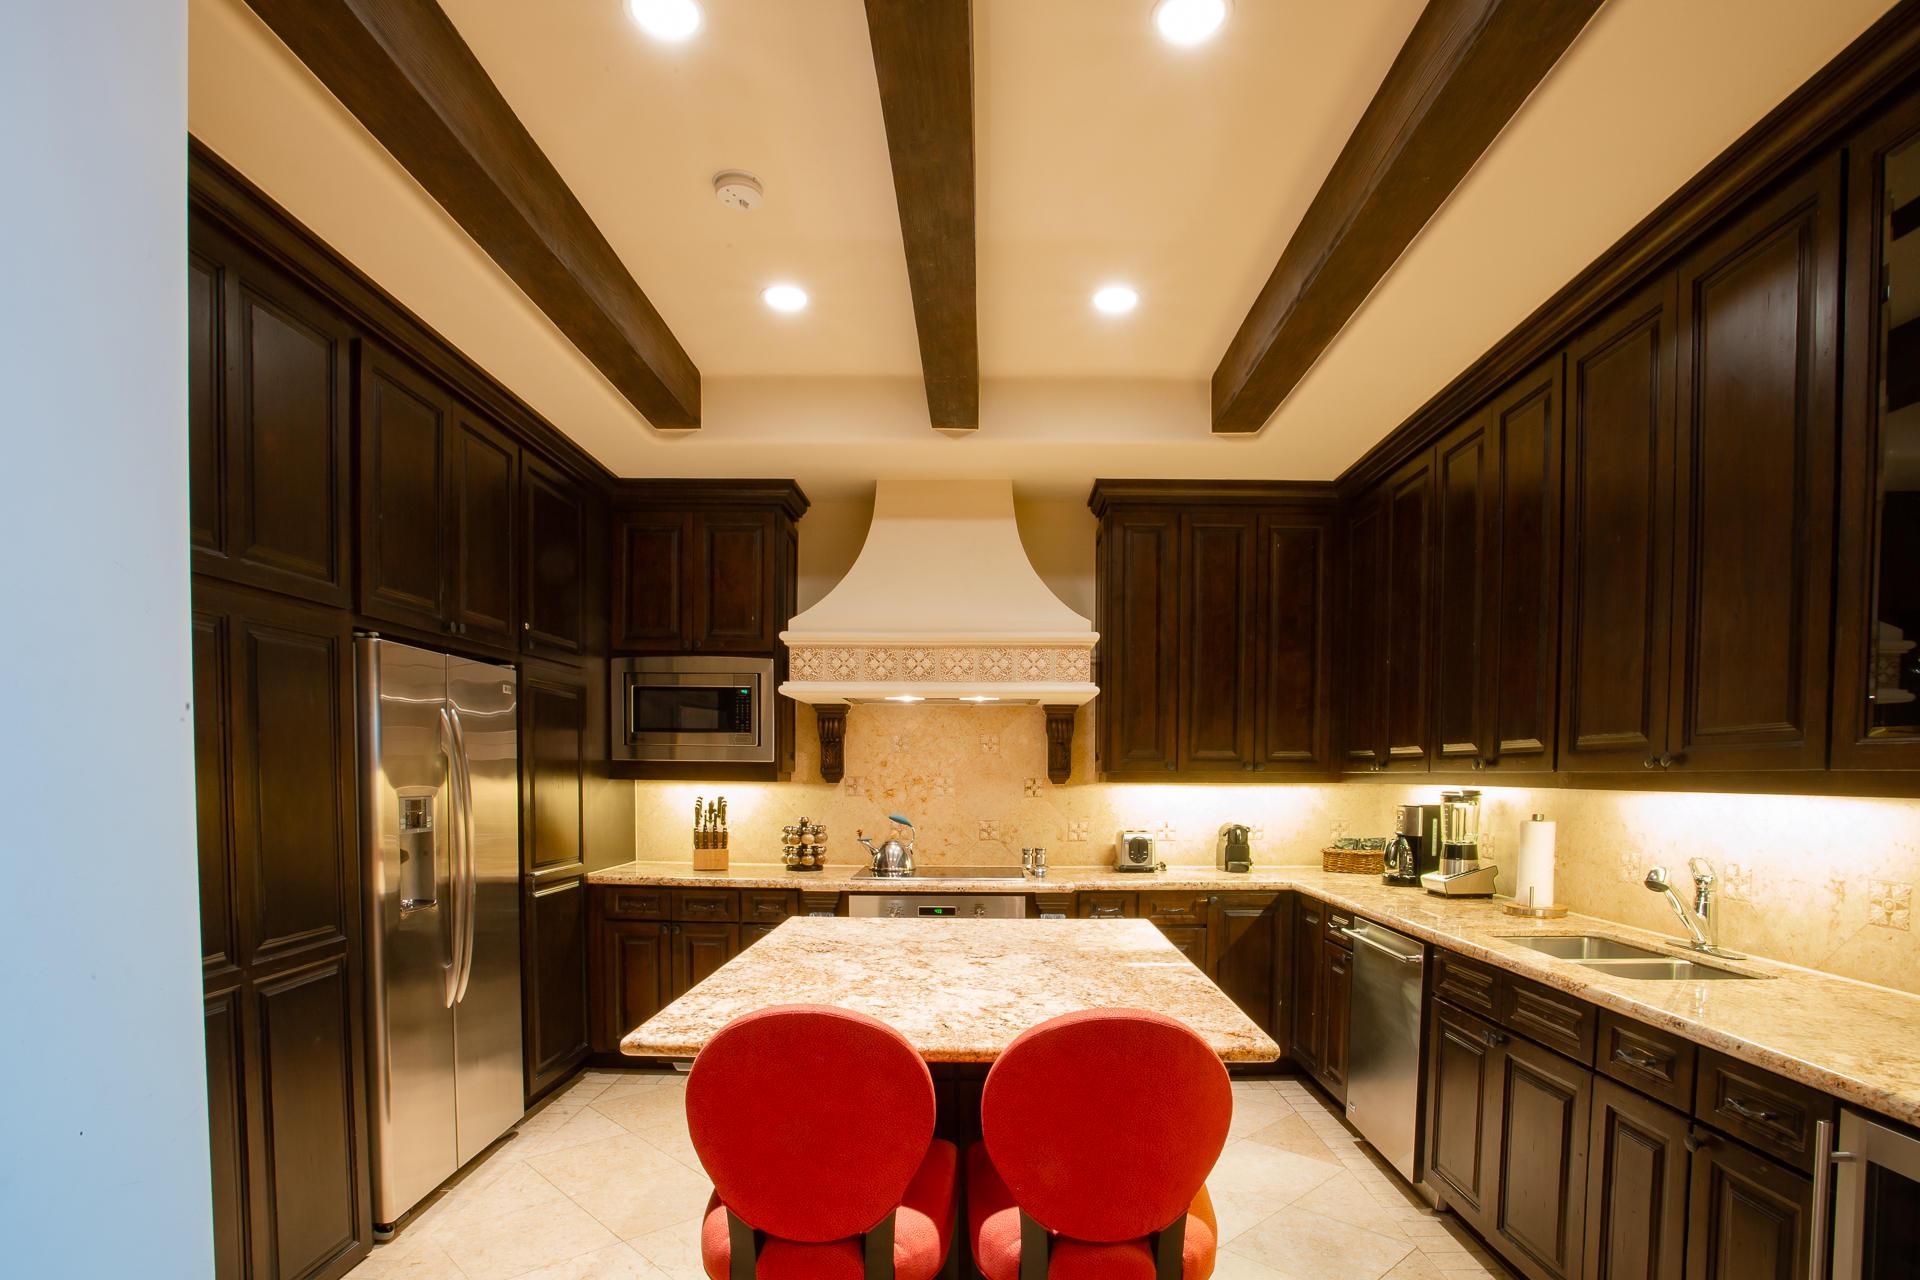 Residence 2-403-11